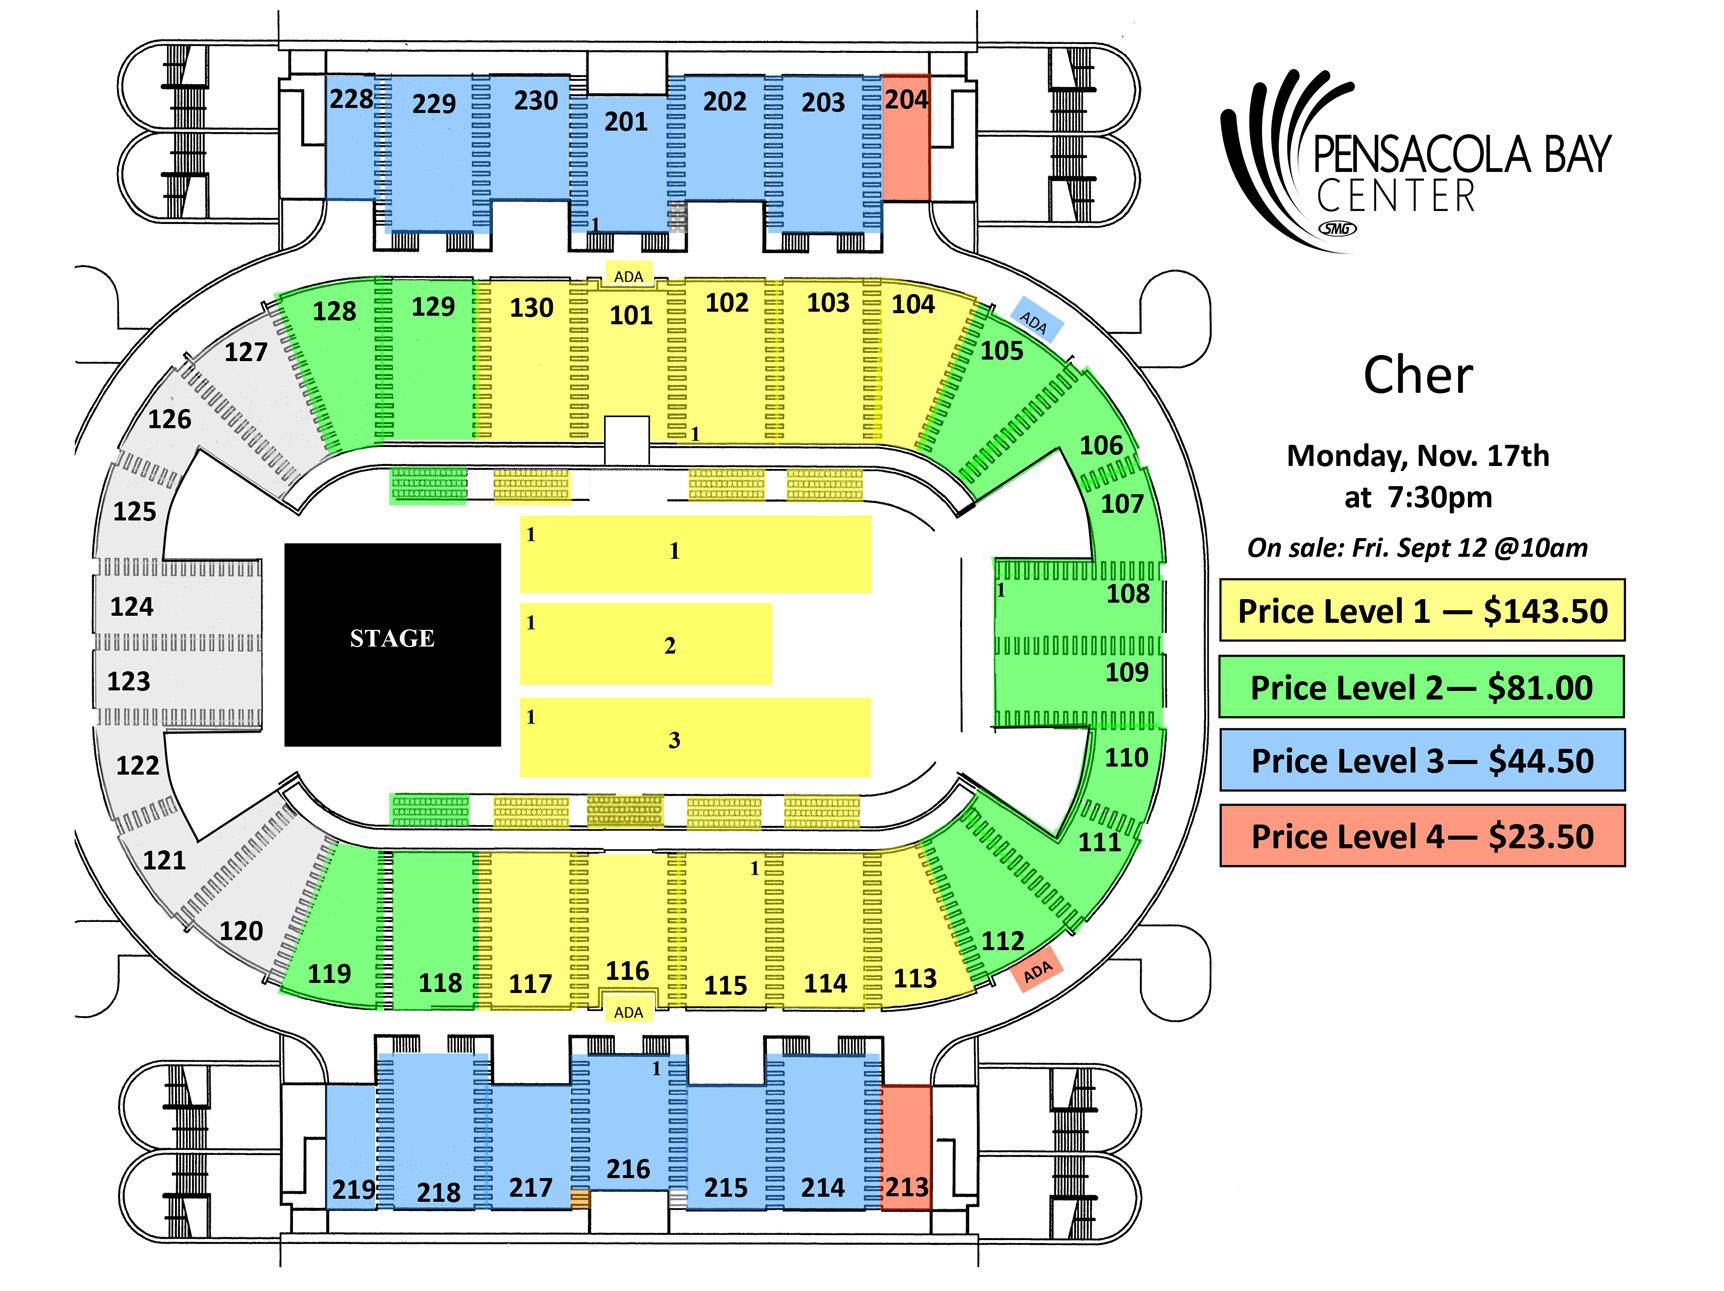 Pensacola Bay Center Cher S D2k Tour 2014 Postponed